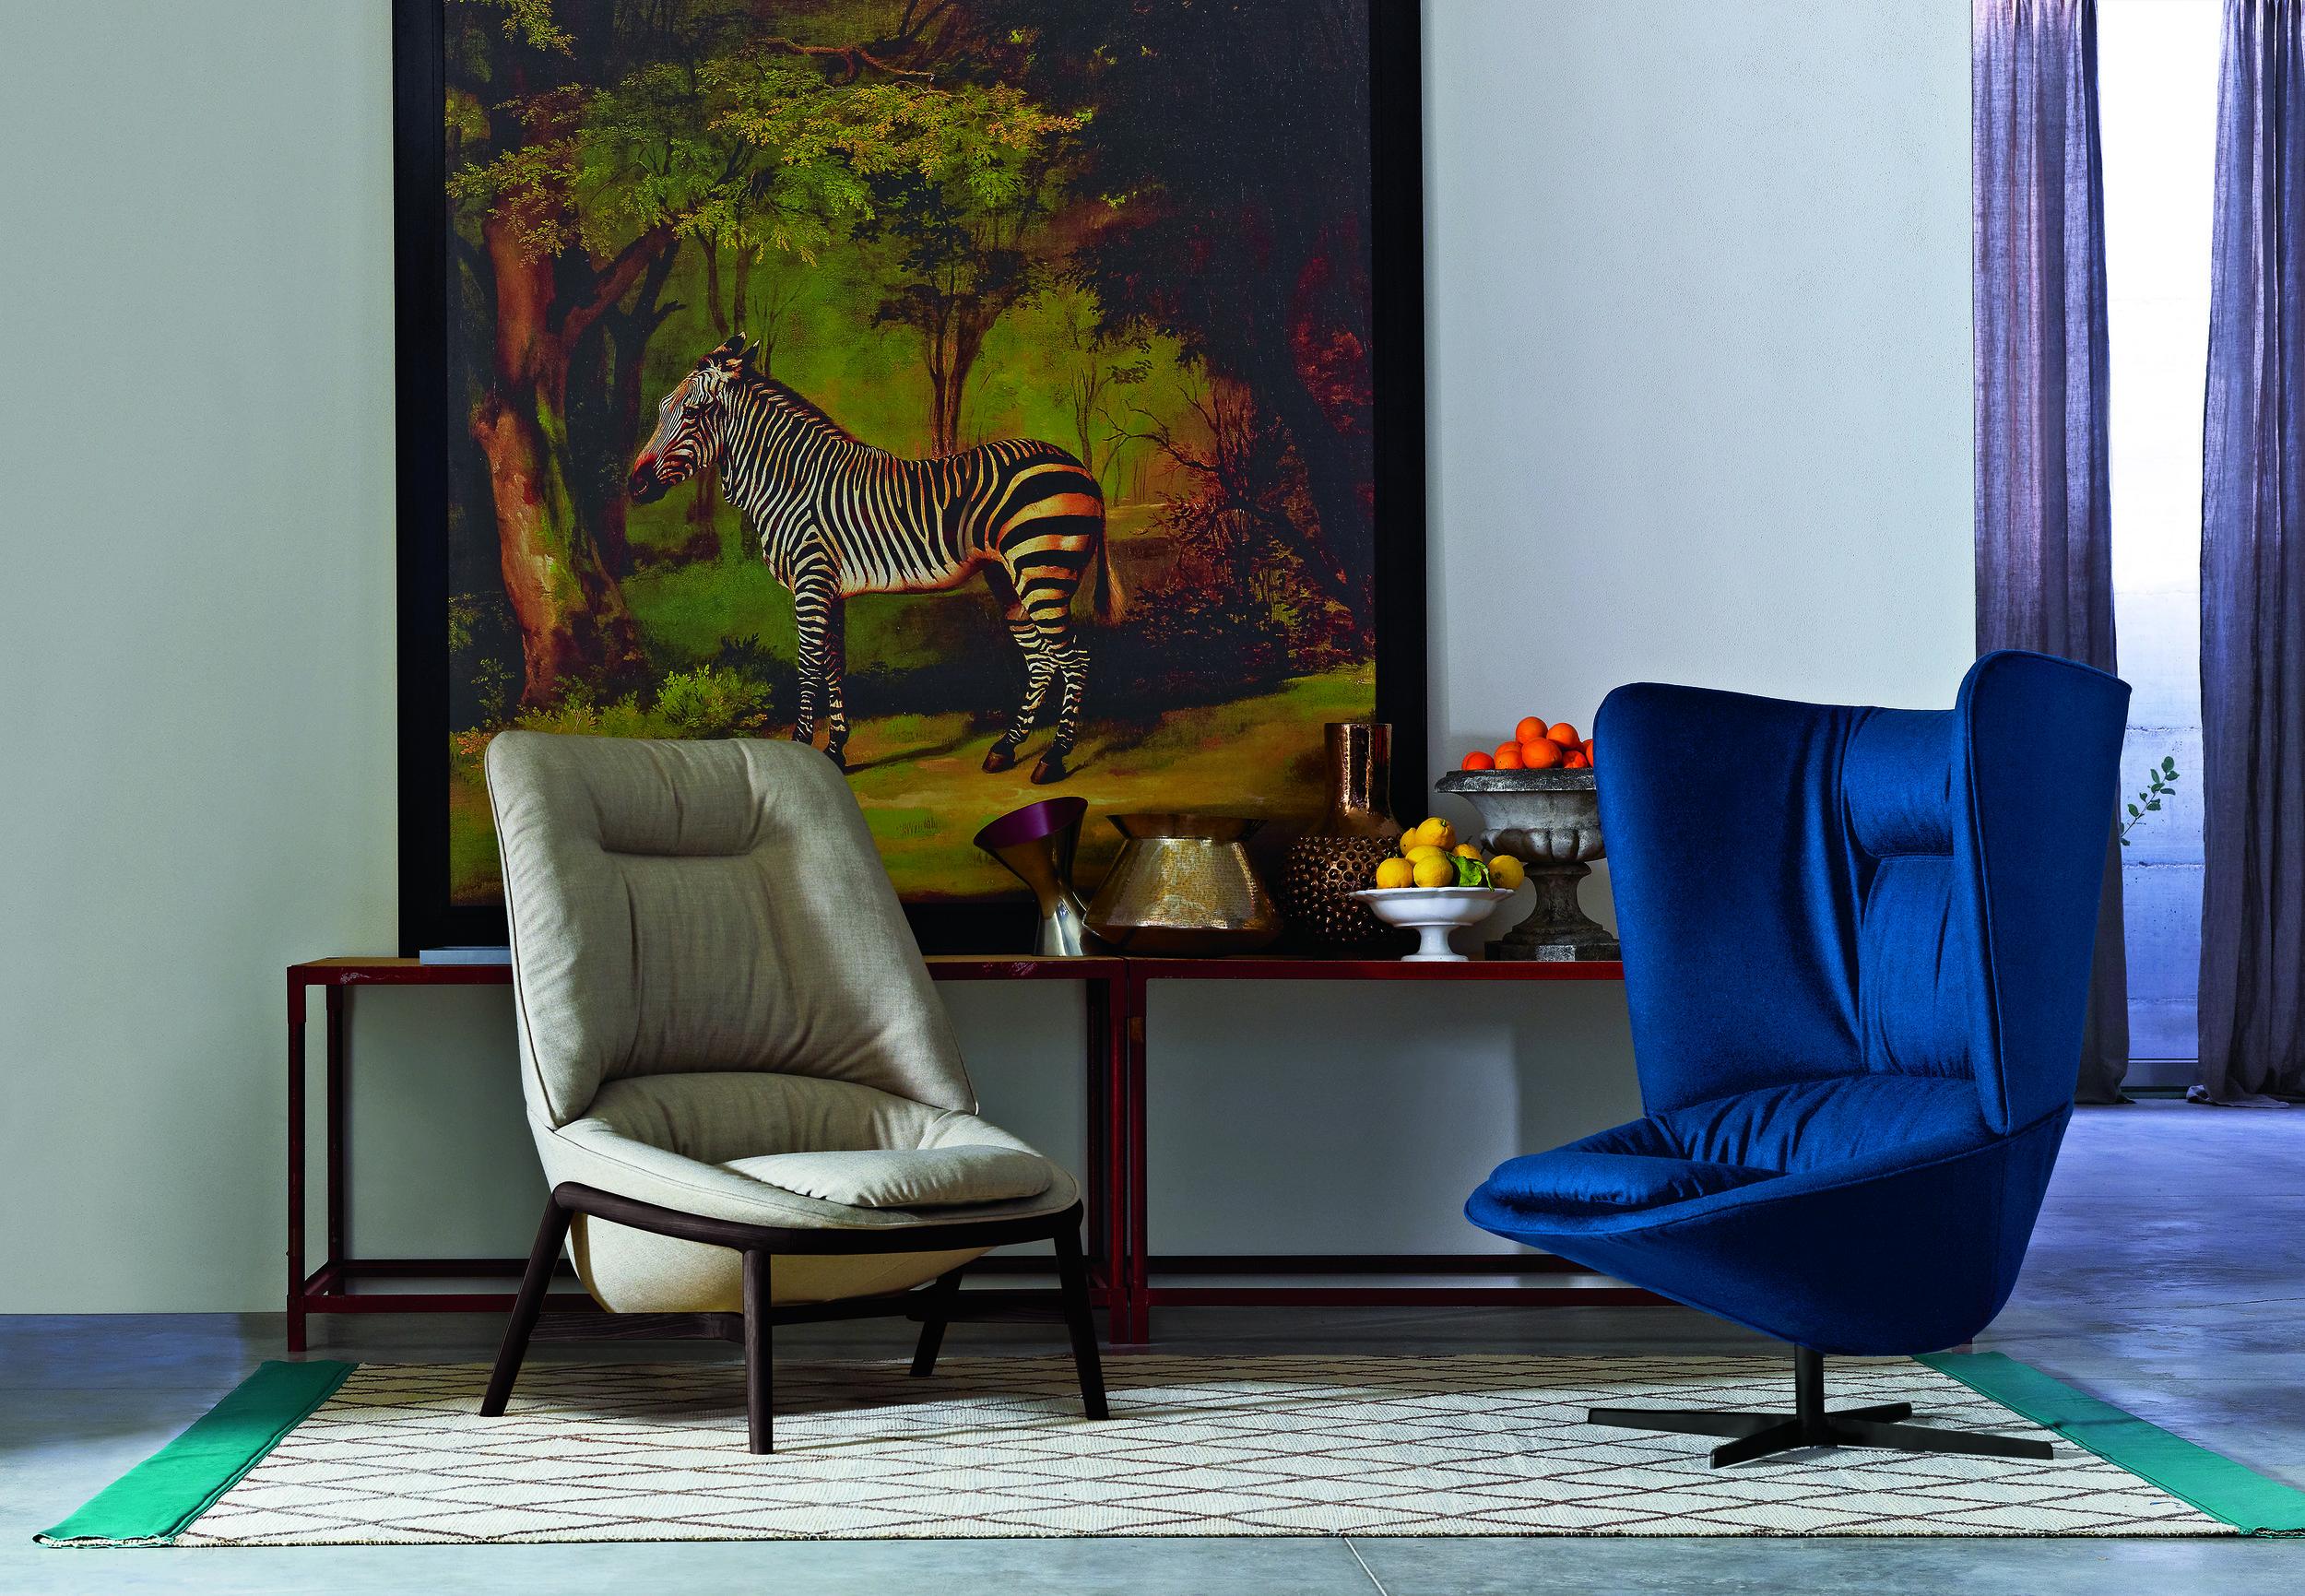 Ladle Chair by Arflex